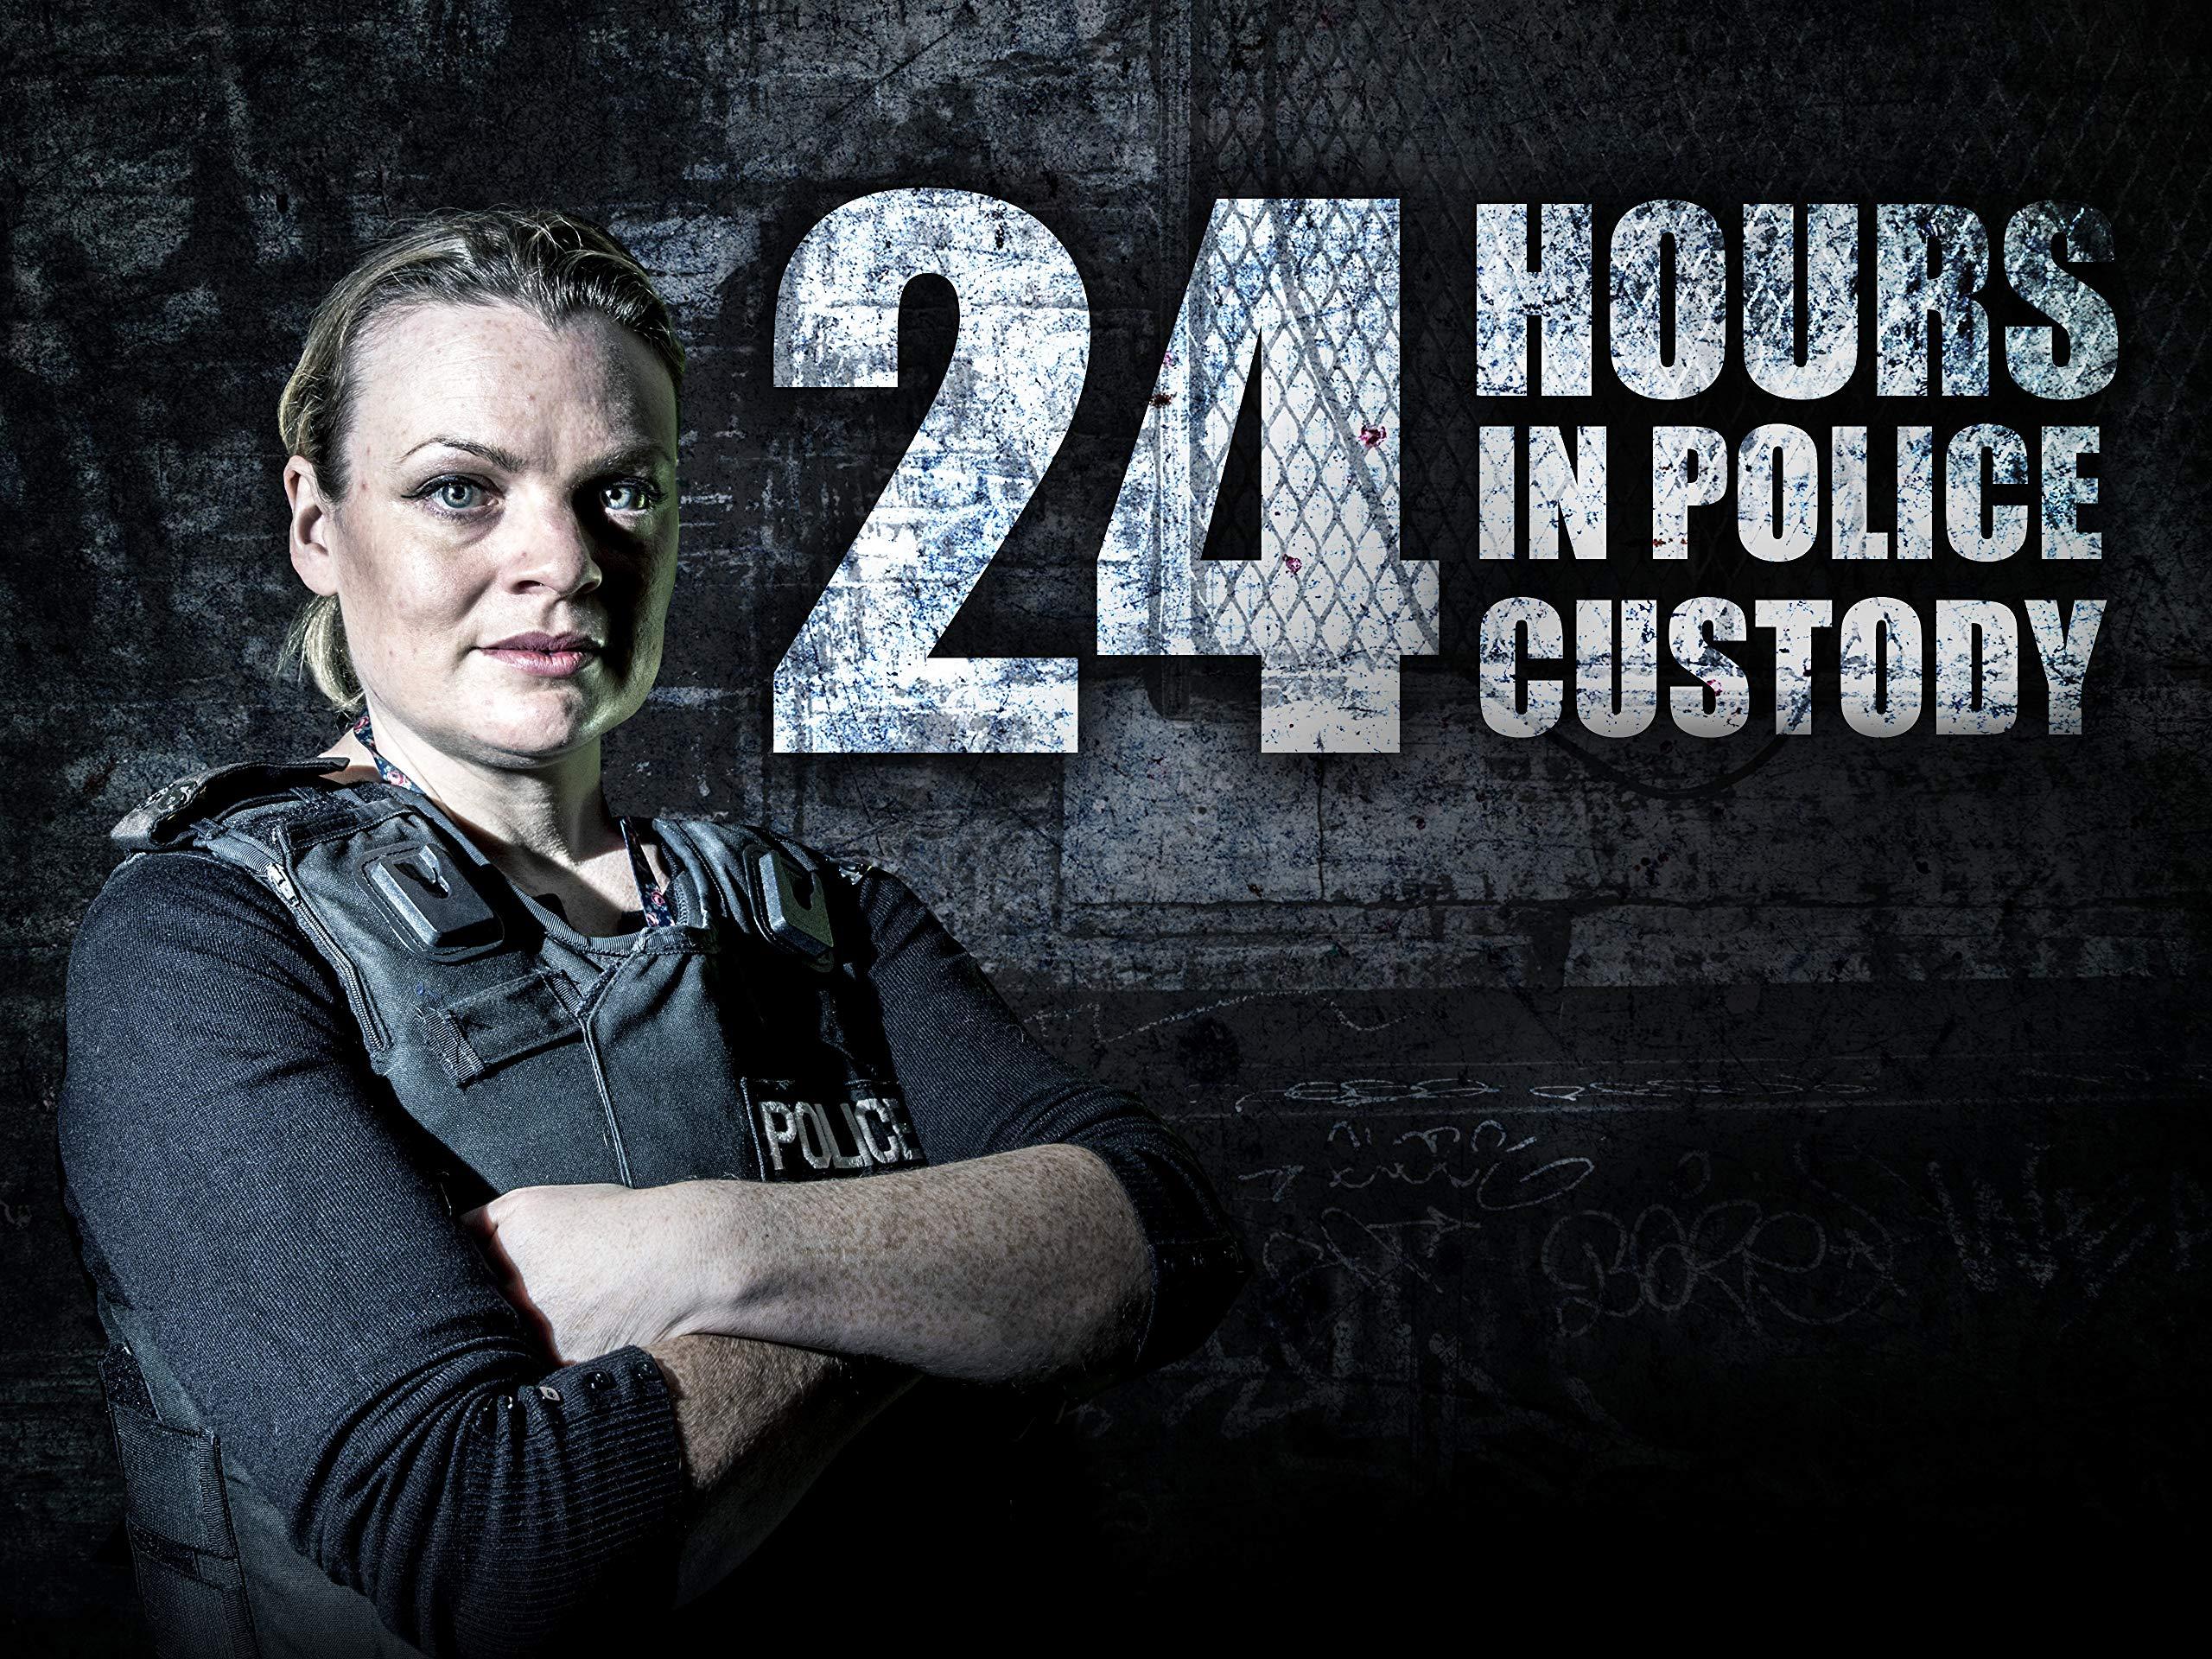 24 hours in police custody watch online free